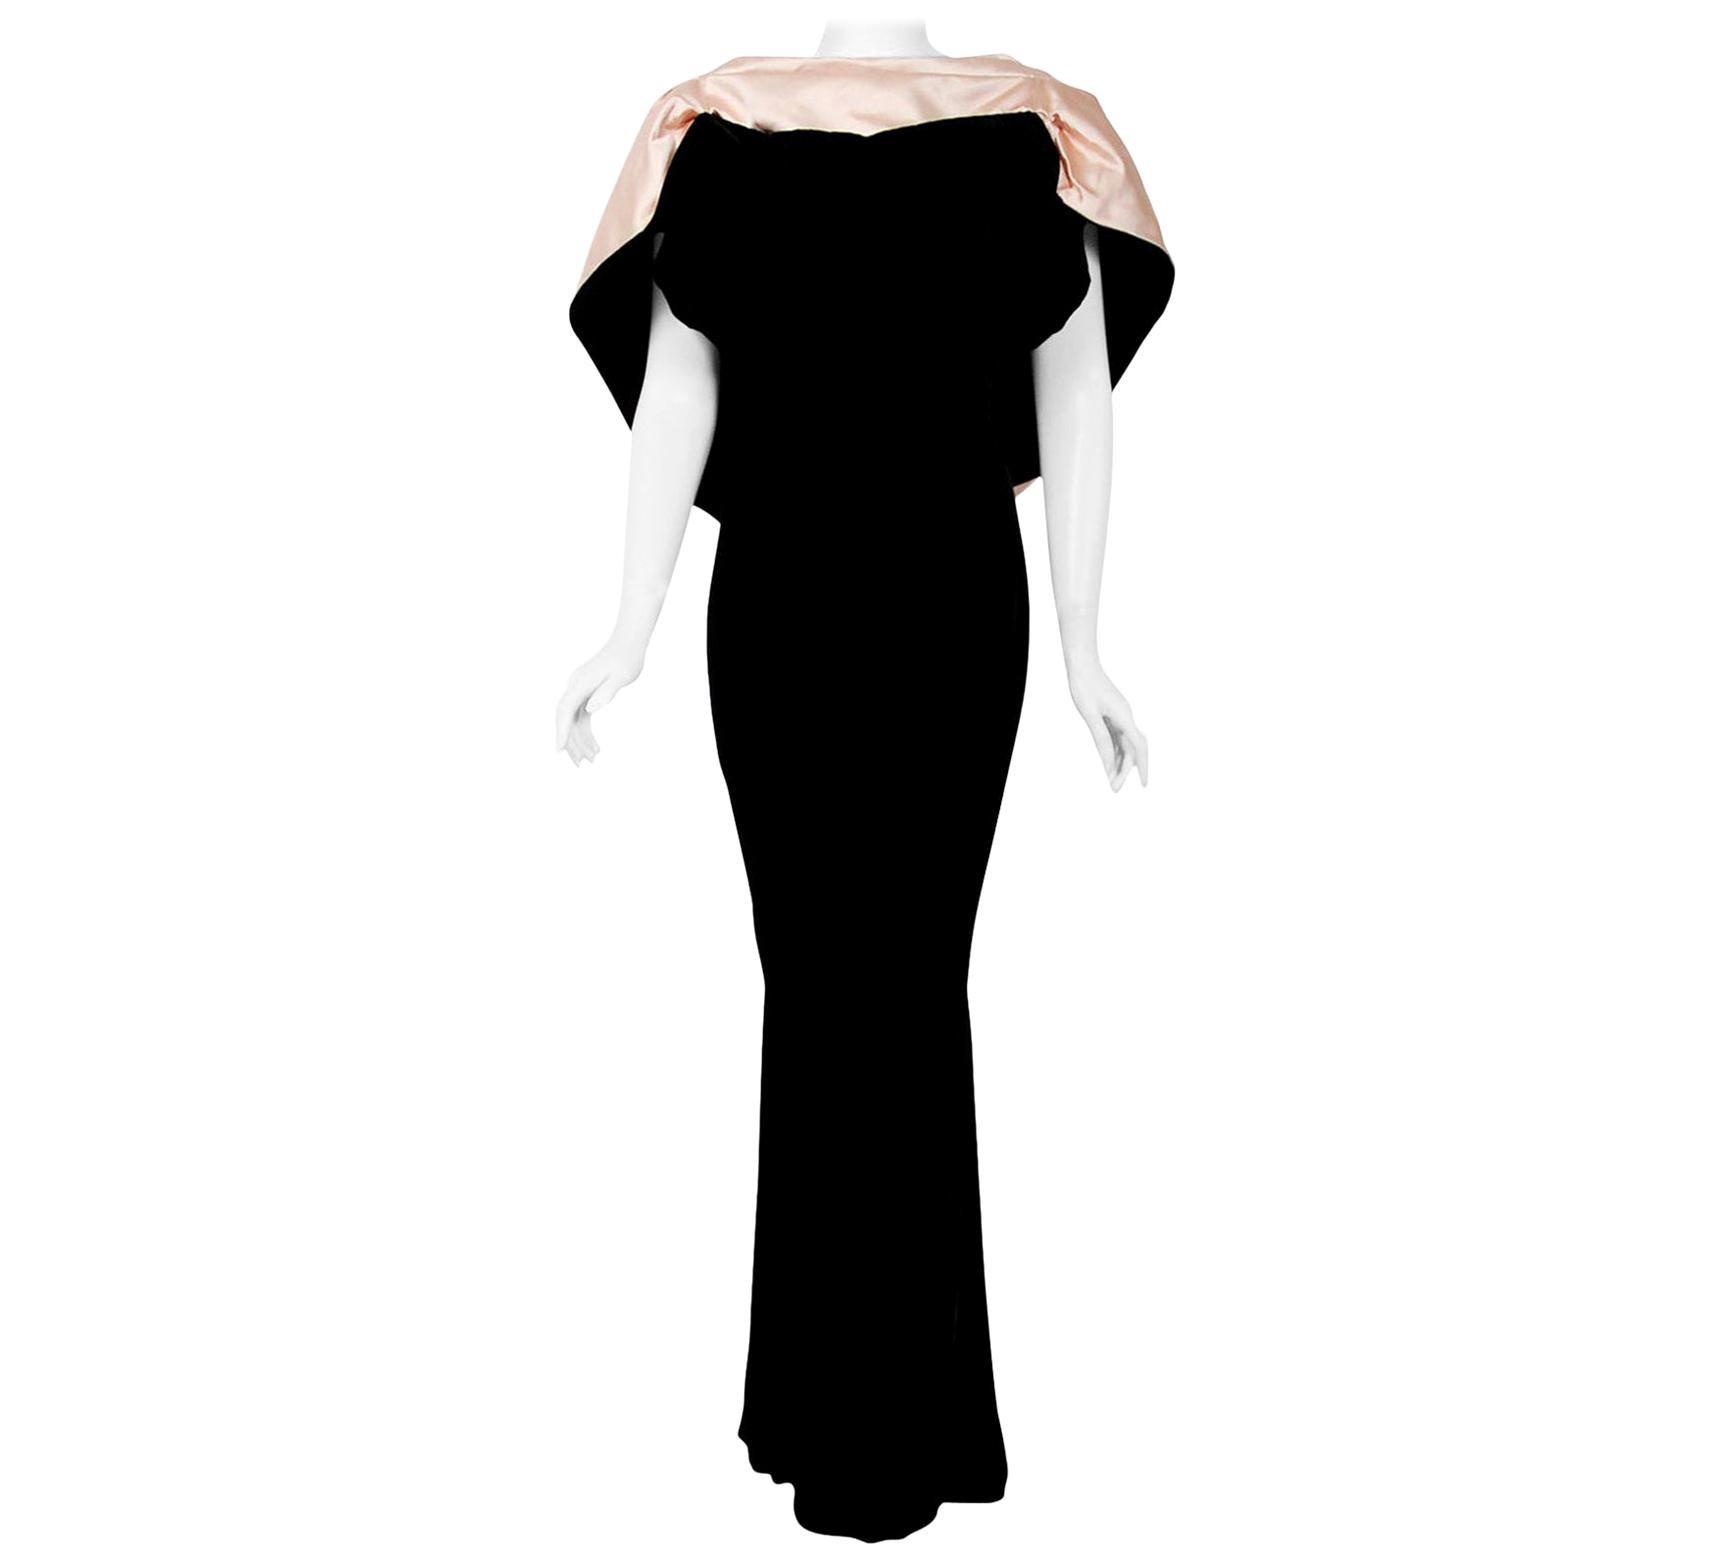 Vintage 1987 Thierry Mugler Museum-Held Velvet & Satin Bias-Cut Backless Gown